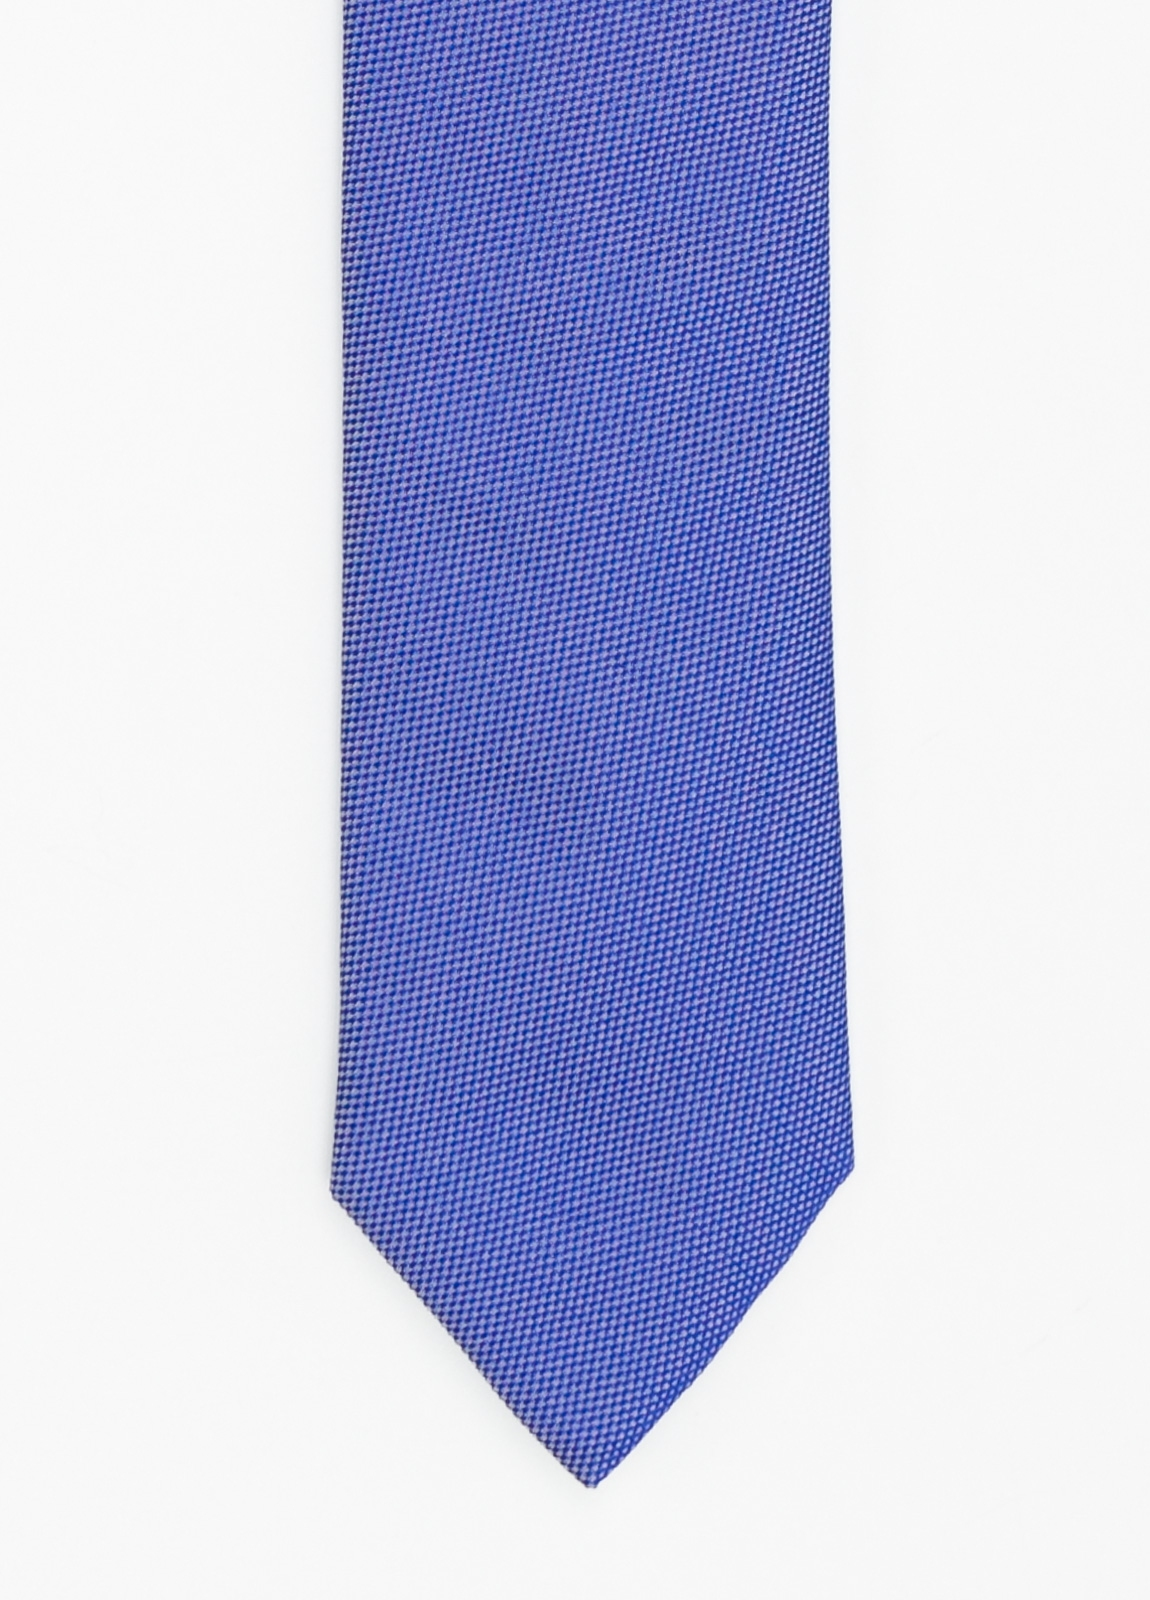 Corbata Formal Wear microtextura color azul. Pala 7,5 cm. 100% Seda.